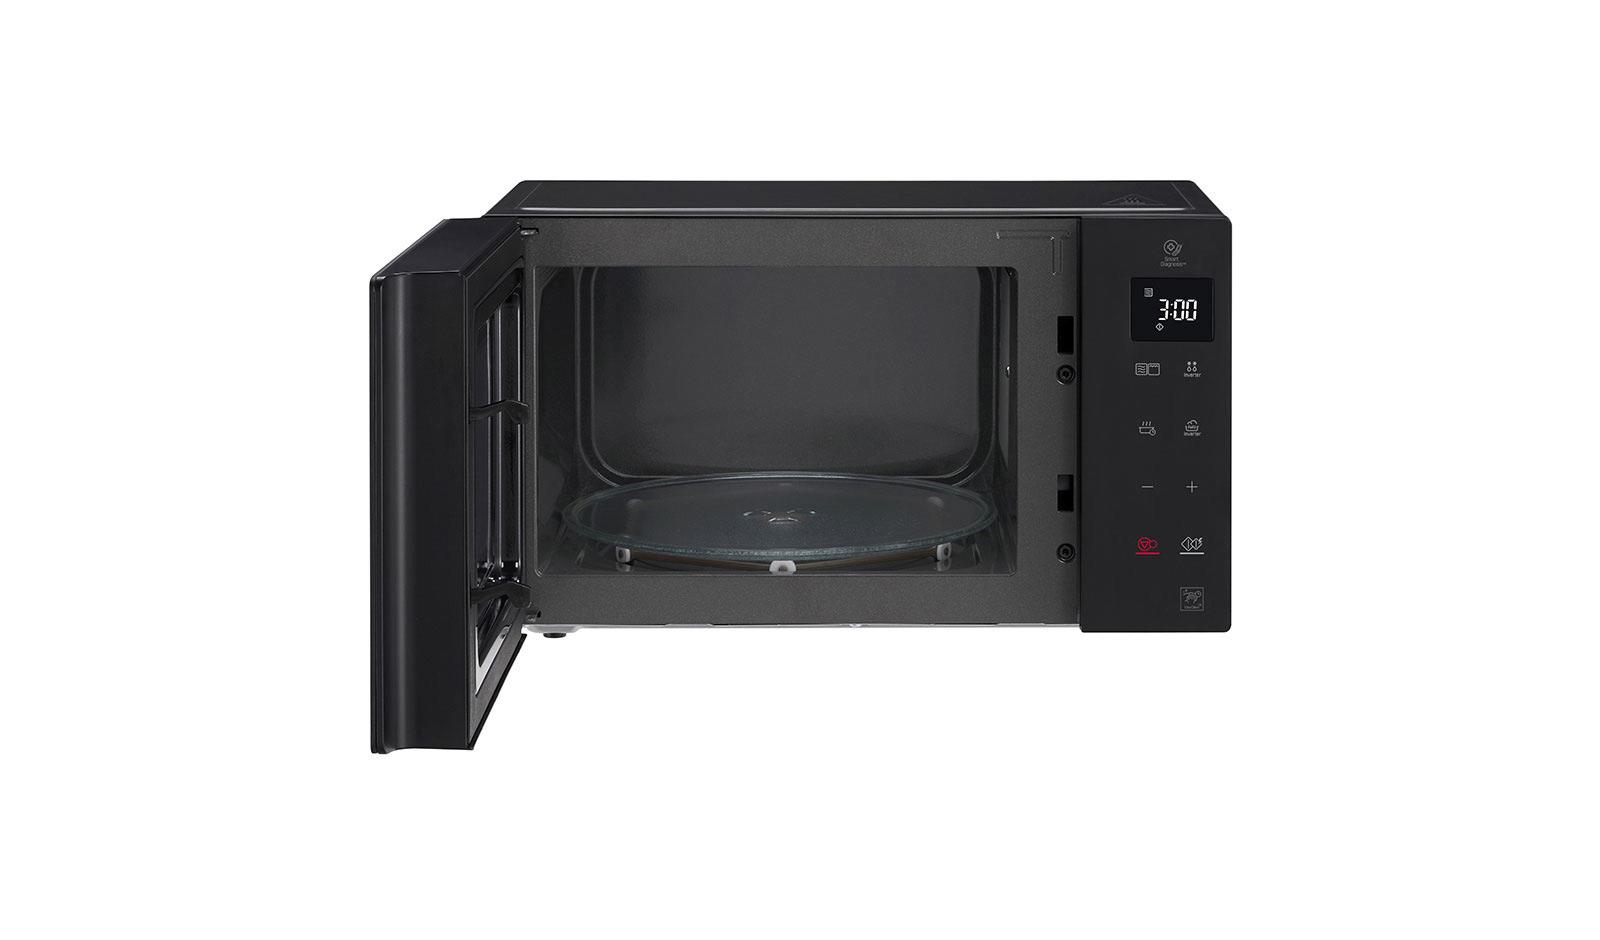 lg mh6336gib microwave oven grill neochef 23l black